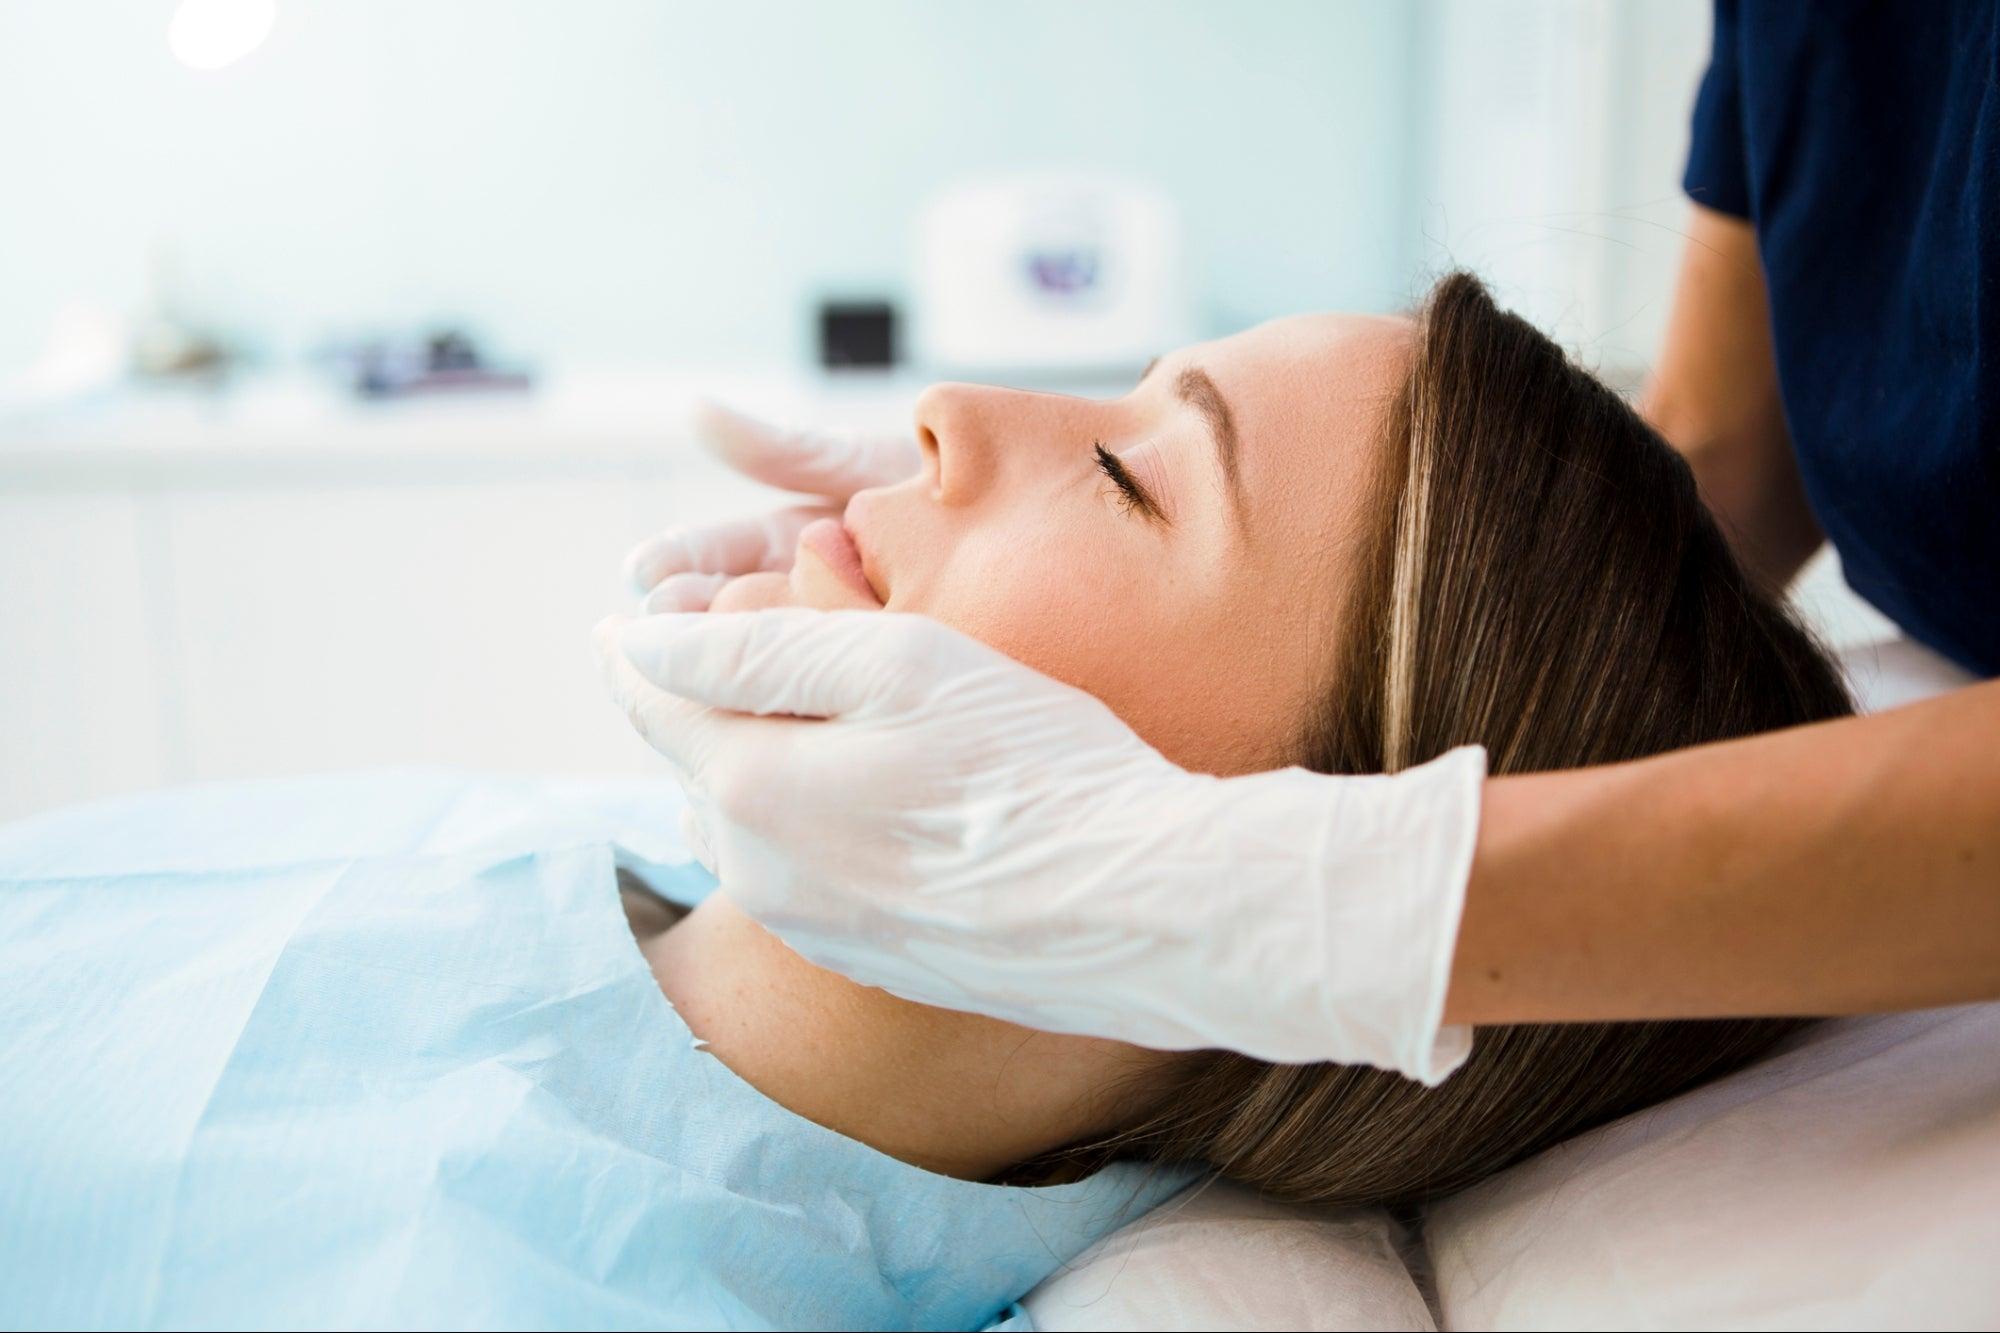 Zoom Boom Triggers Surge in Aesthetic Medical Procedures